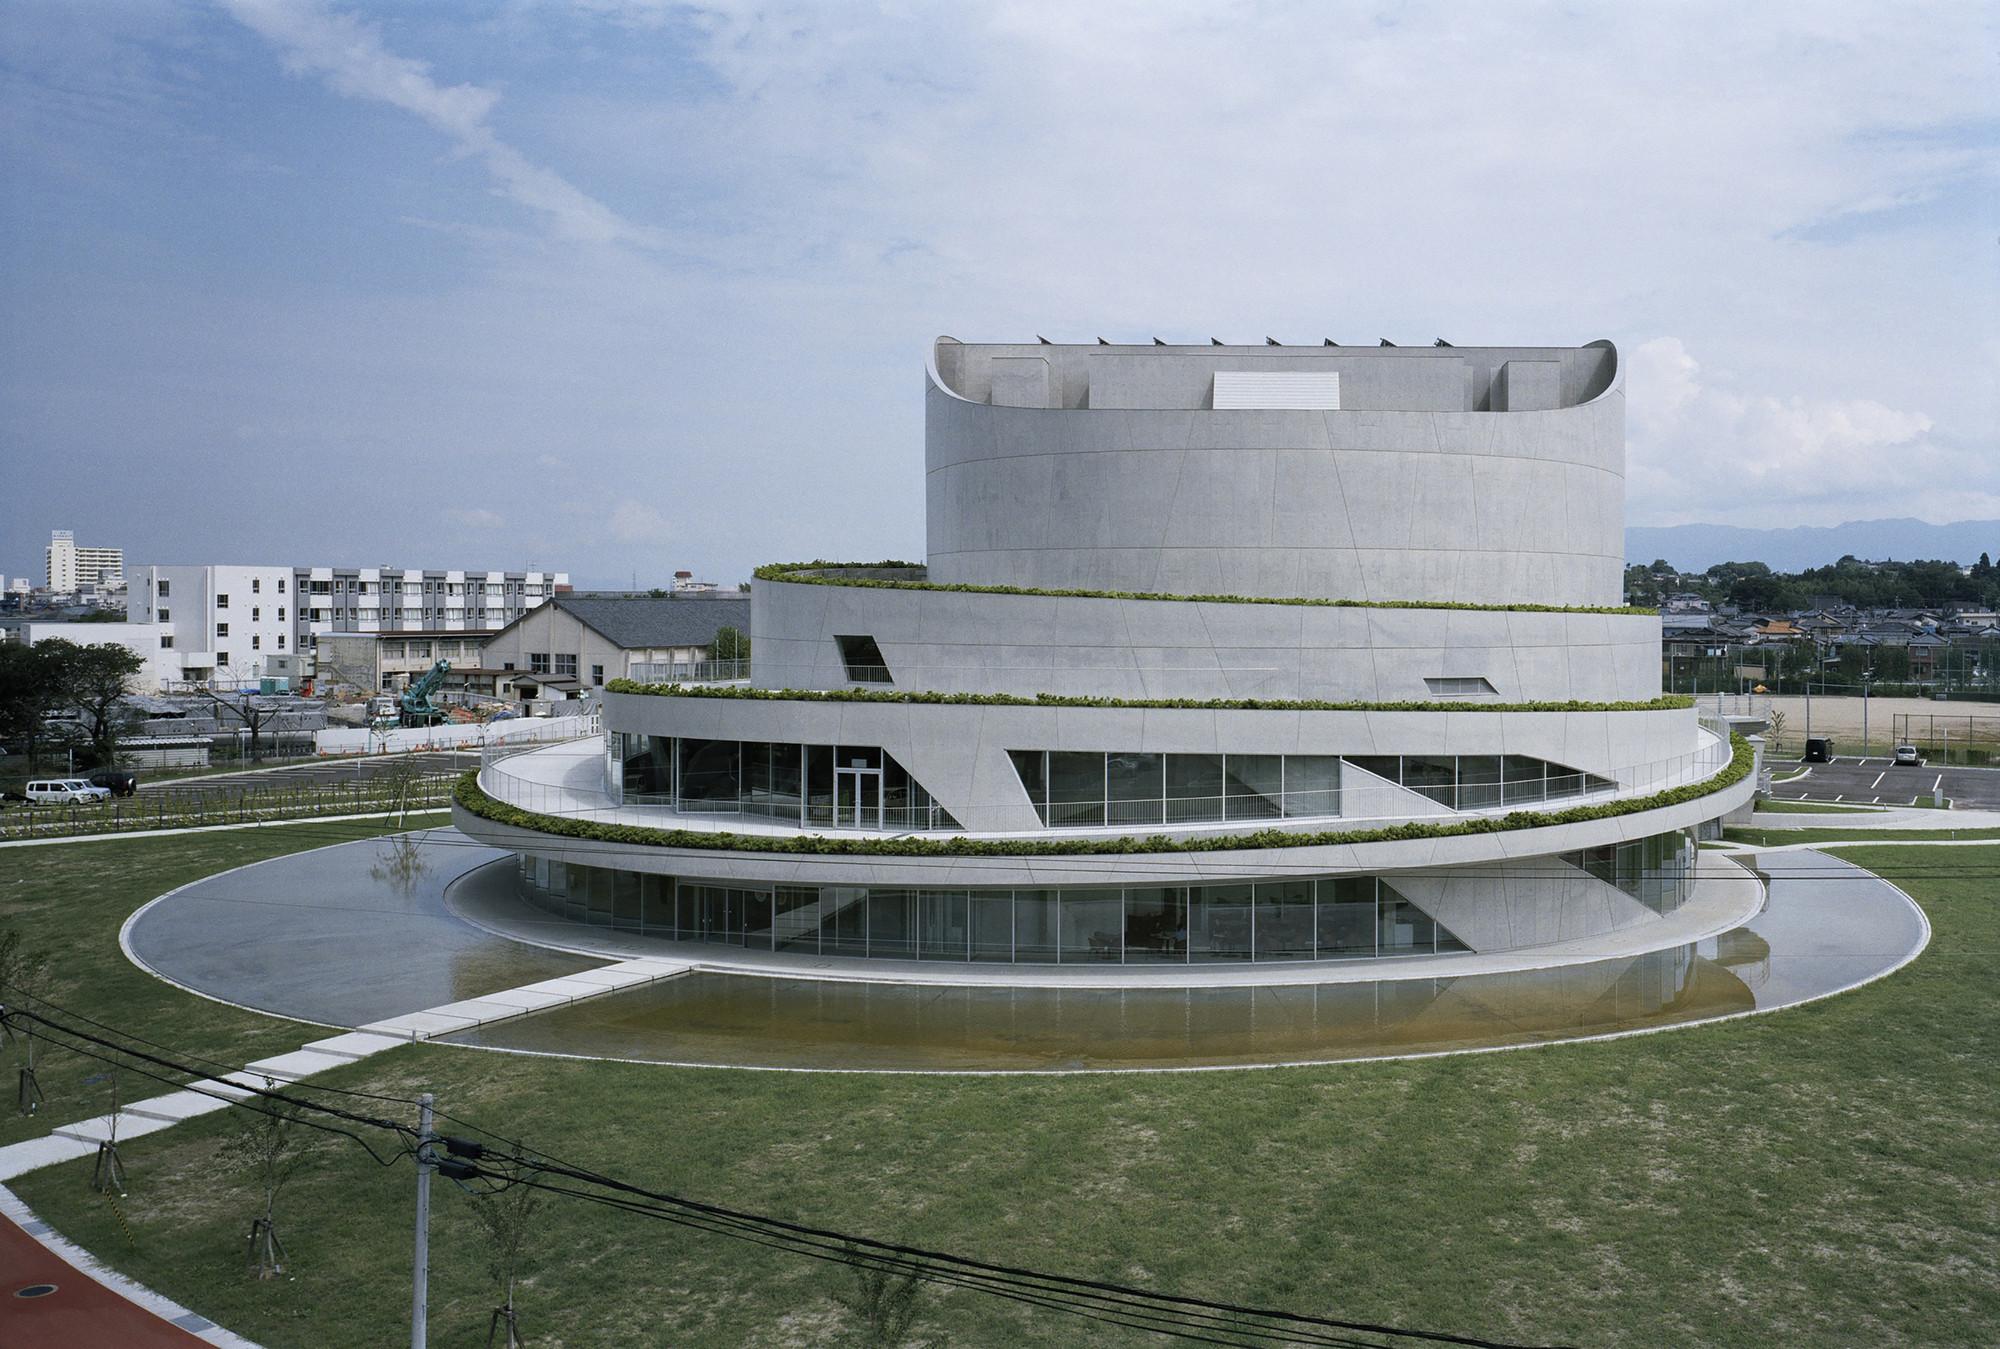 Akiha ward cultural center chiaki arai urban and Arquitectura and design